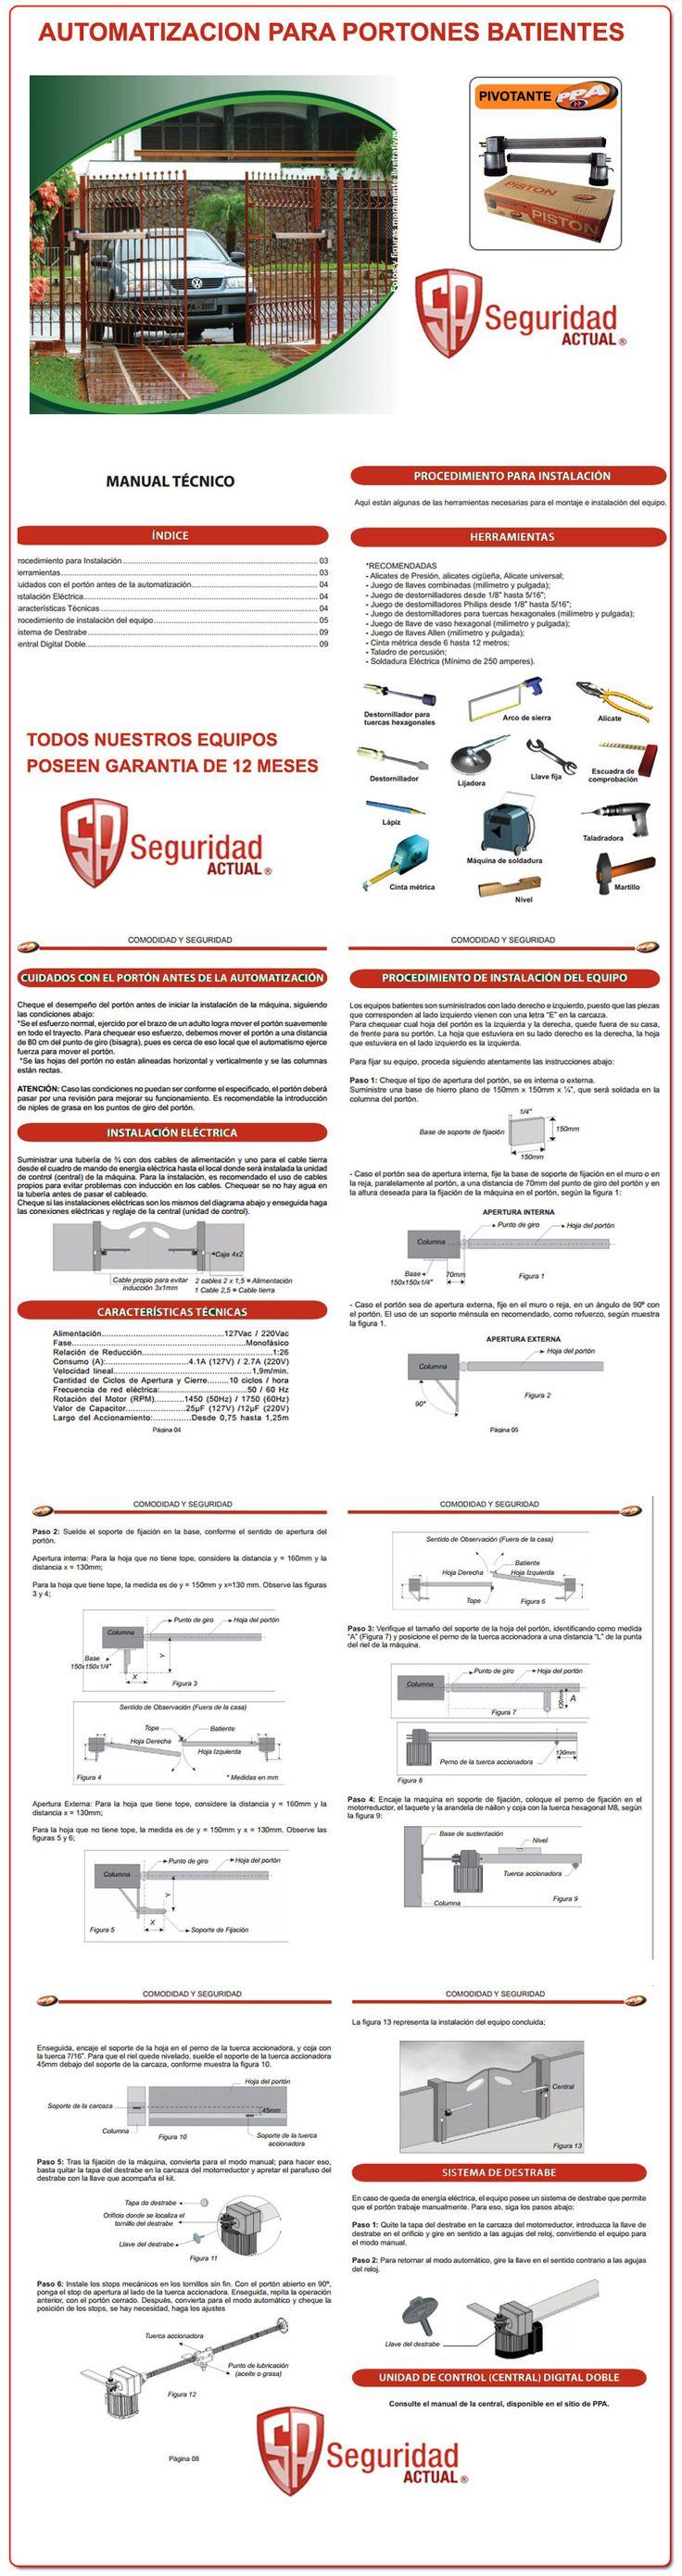 Seguridad Actual, Automatizacion de portones, corredizos, pivotantes, SEG, PPA, RCG